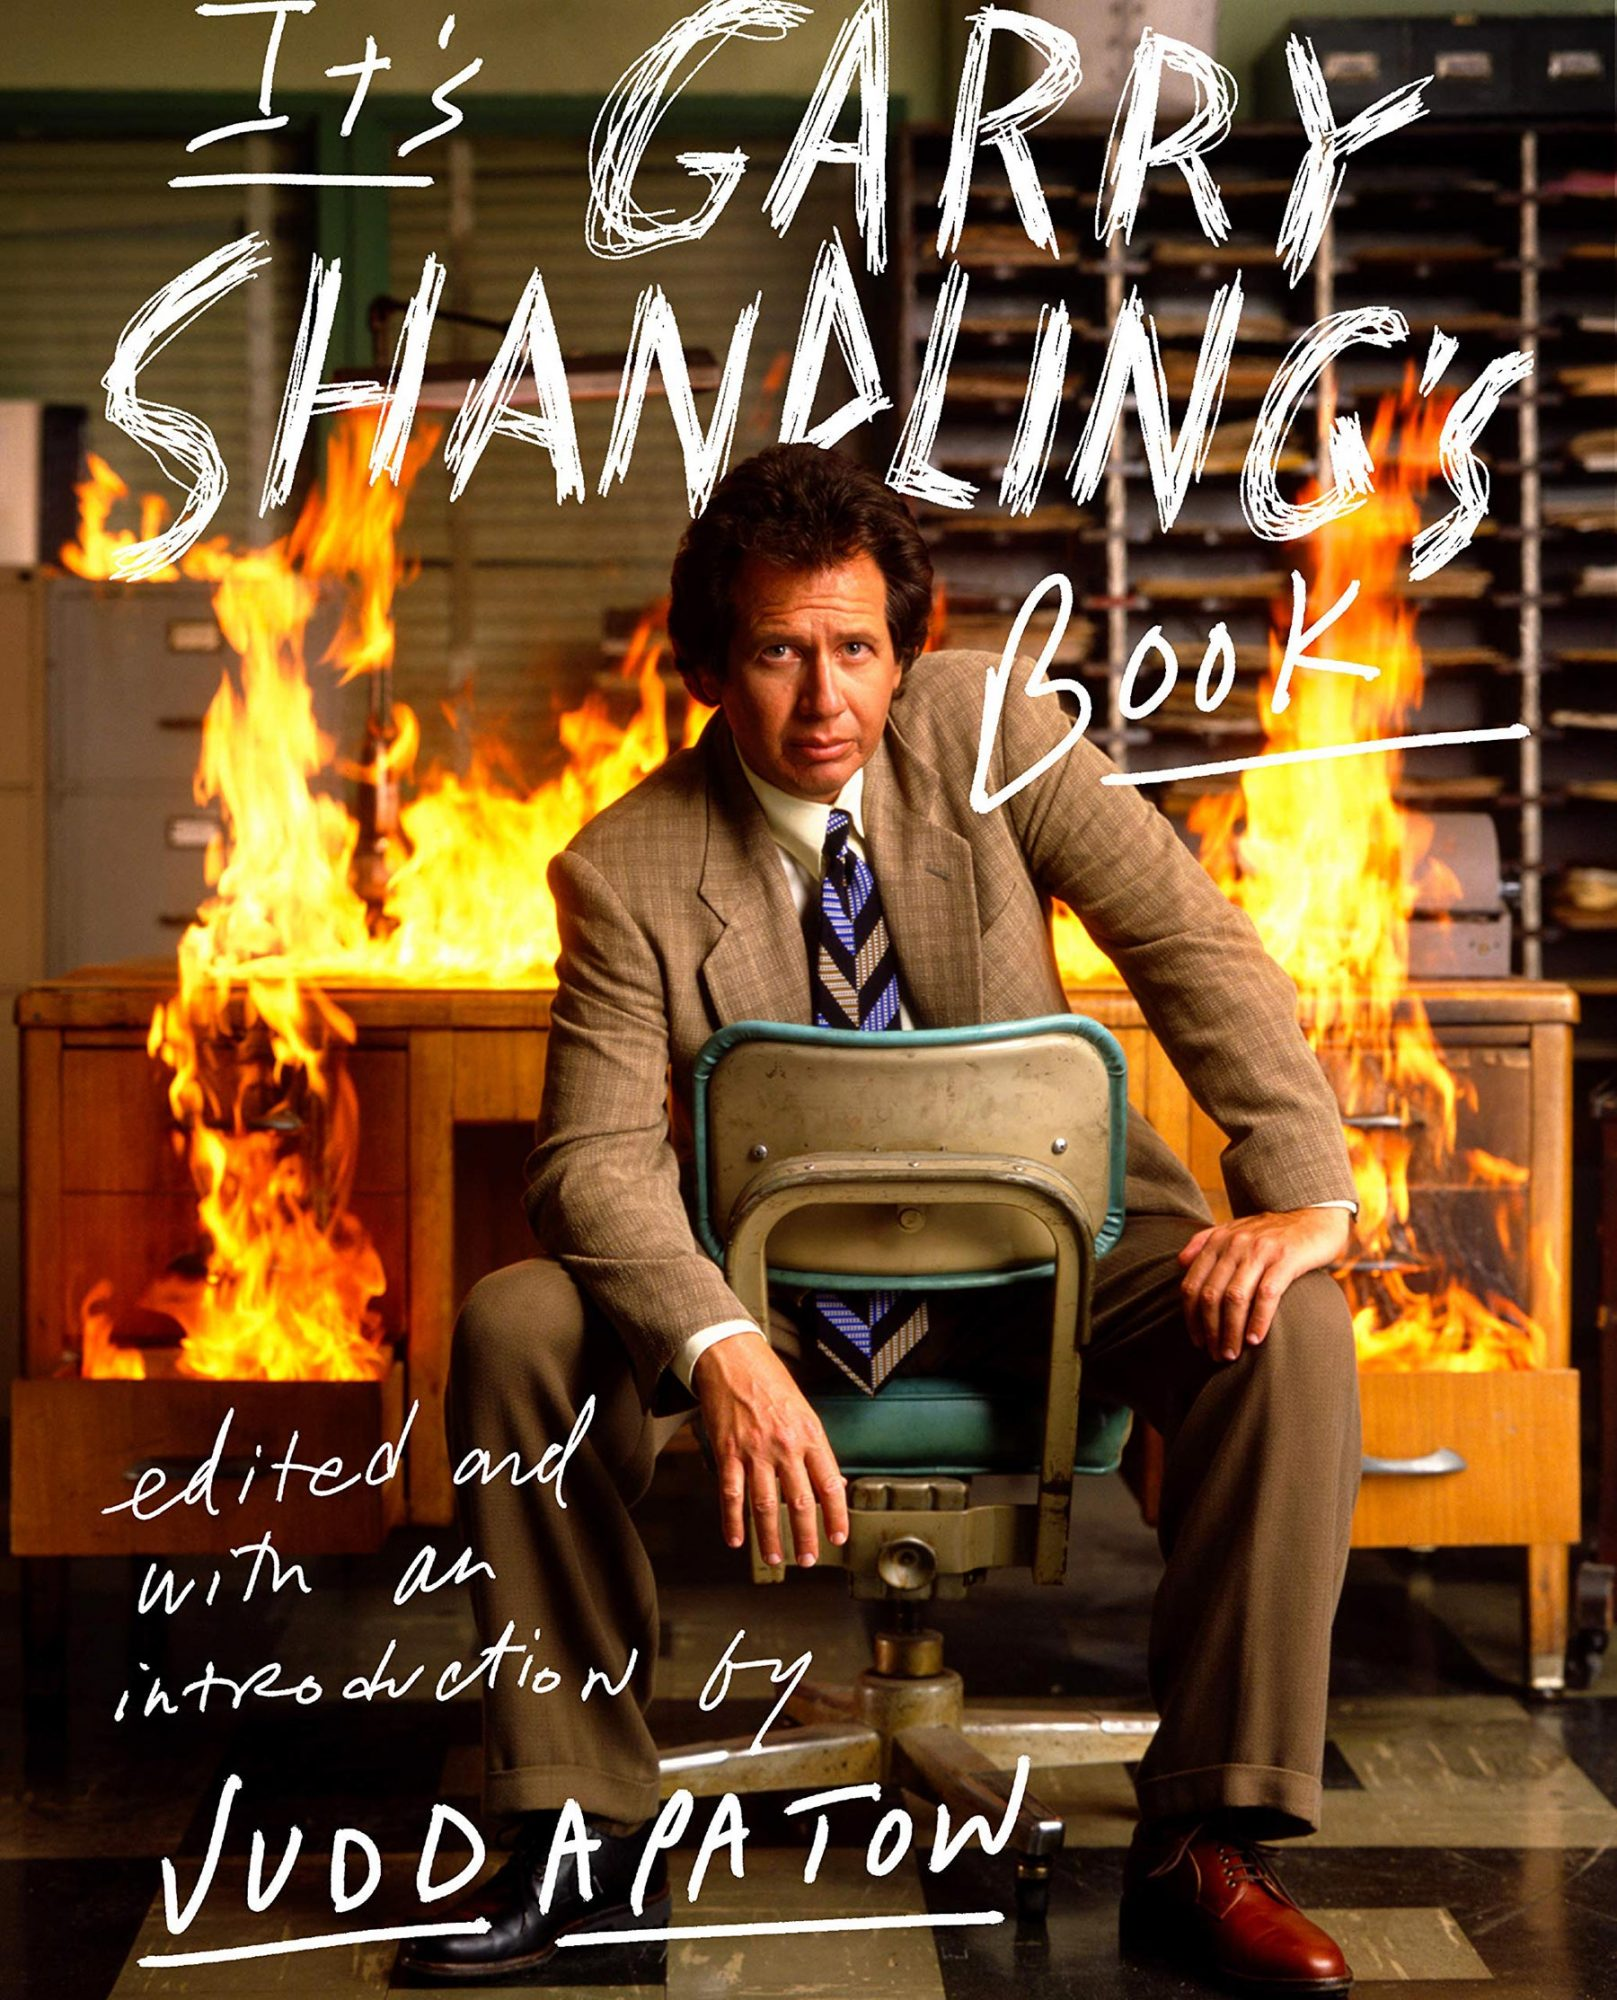 Judd Apatow, It's Gary Shandling's BookPublisher: Random House